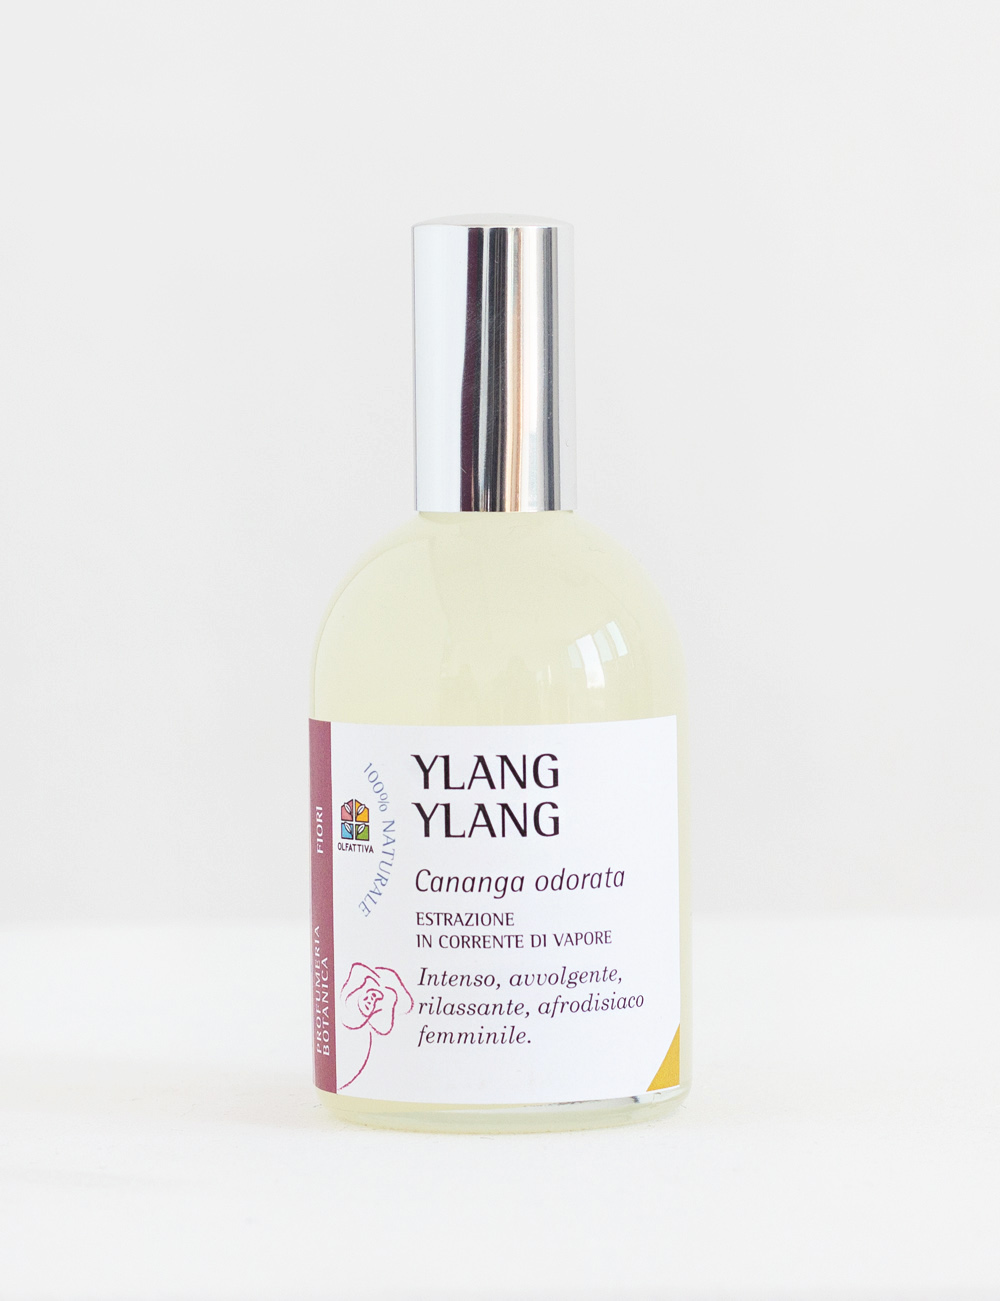 Profumo Naturale Ylang Ylang:  con Oli Essenziali - Olfattiva